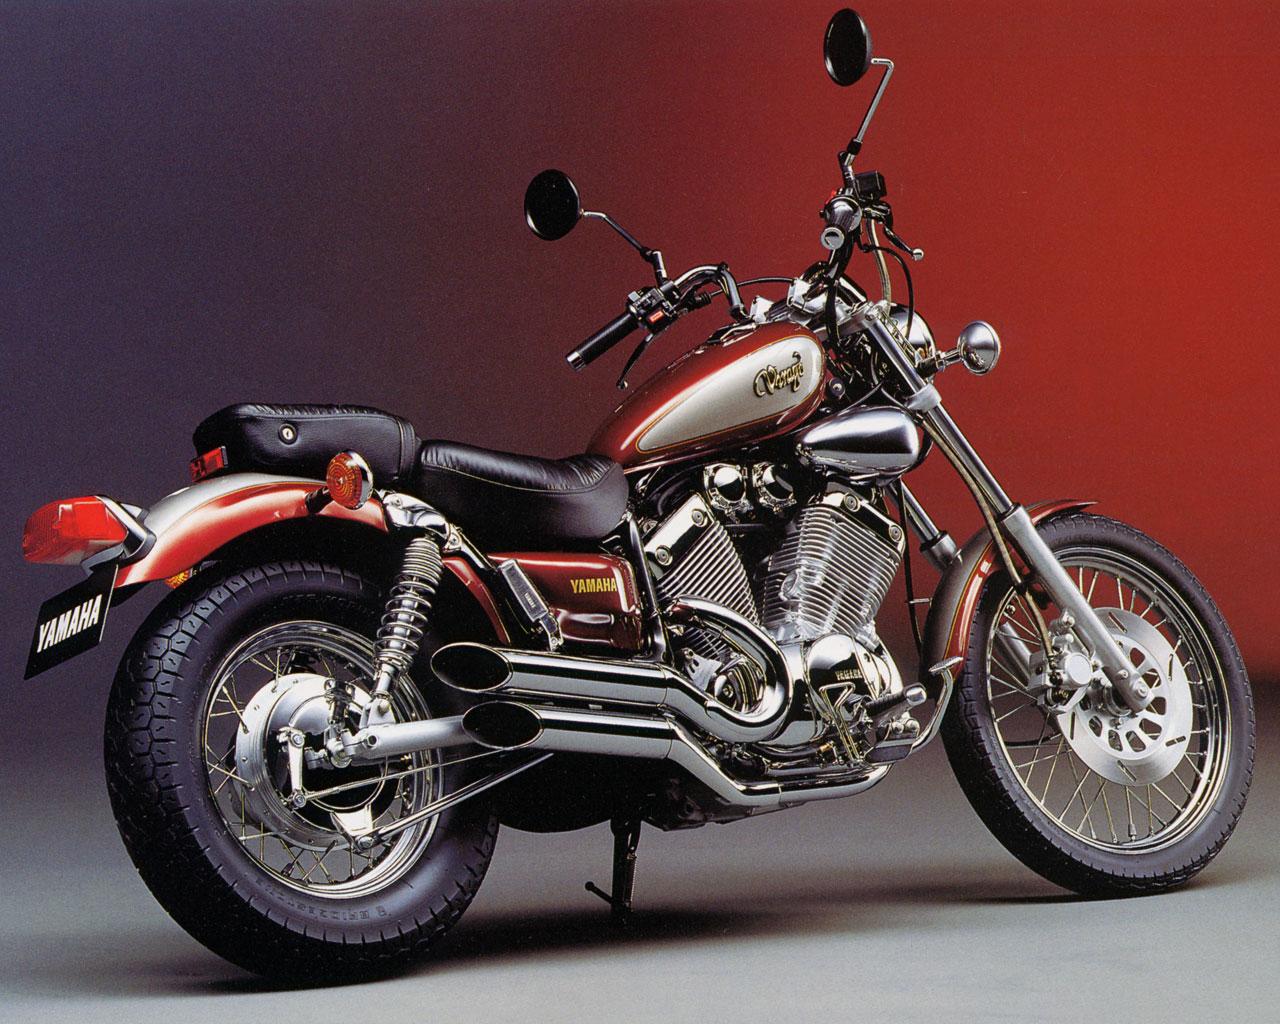 Fondecran2on Yamaha Virago 535